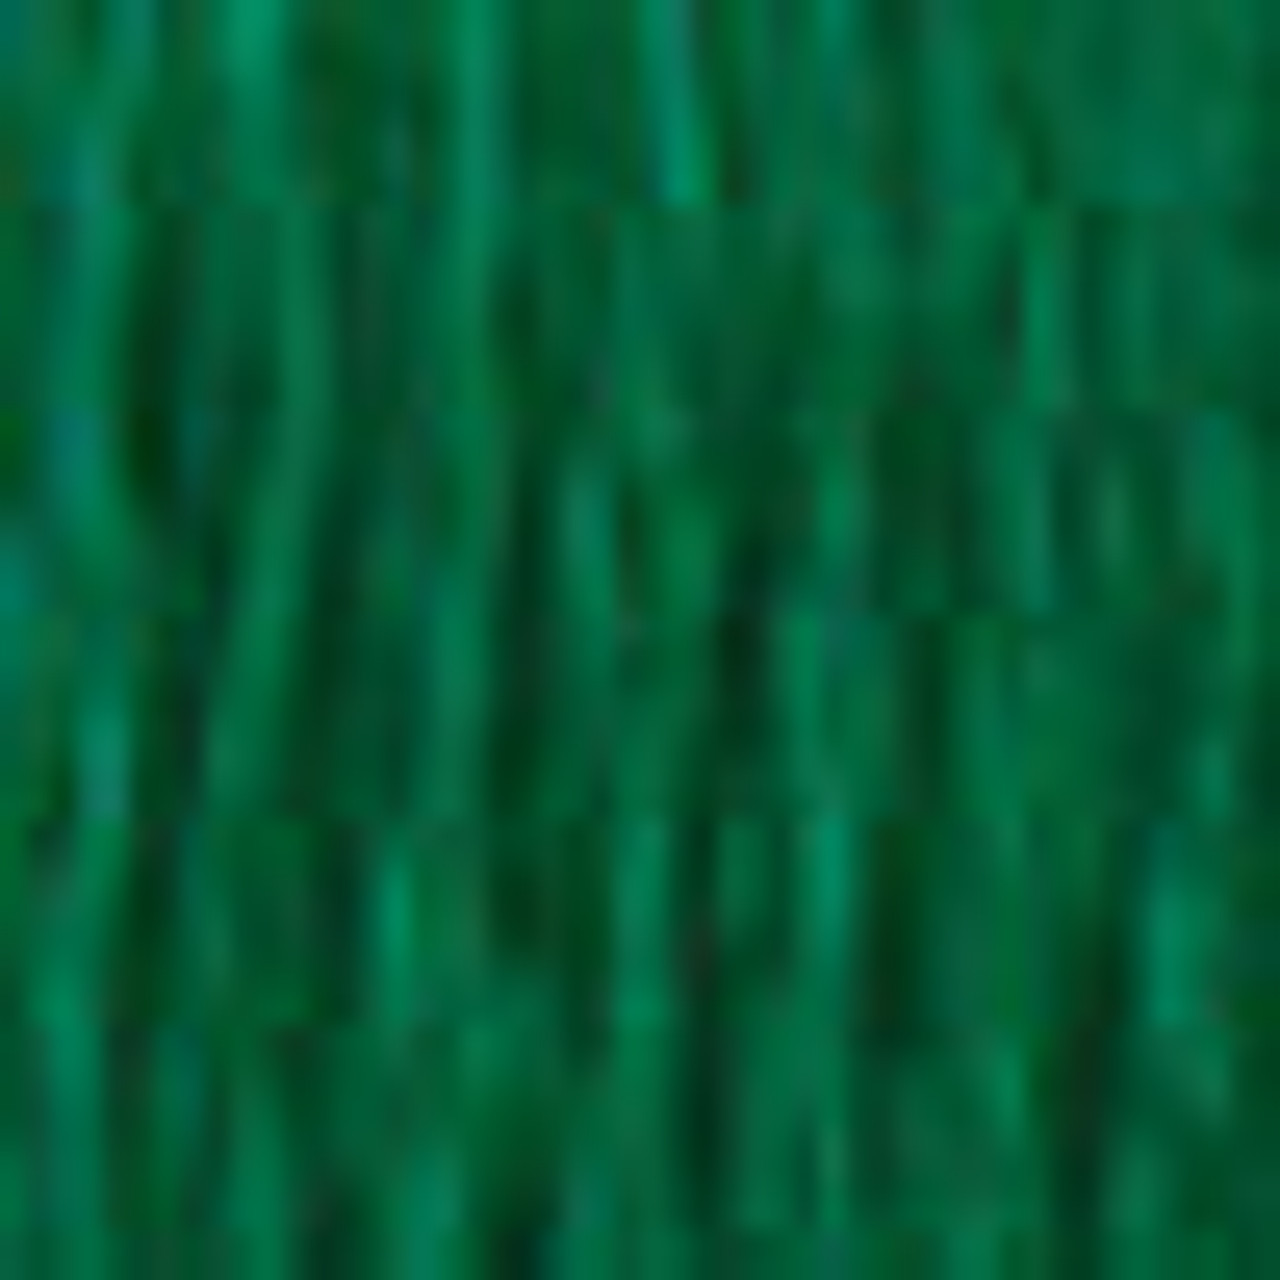 DMC # 3818 Ultra Vy Dk Emerald Grn Floss / Thread